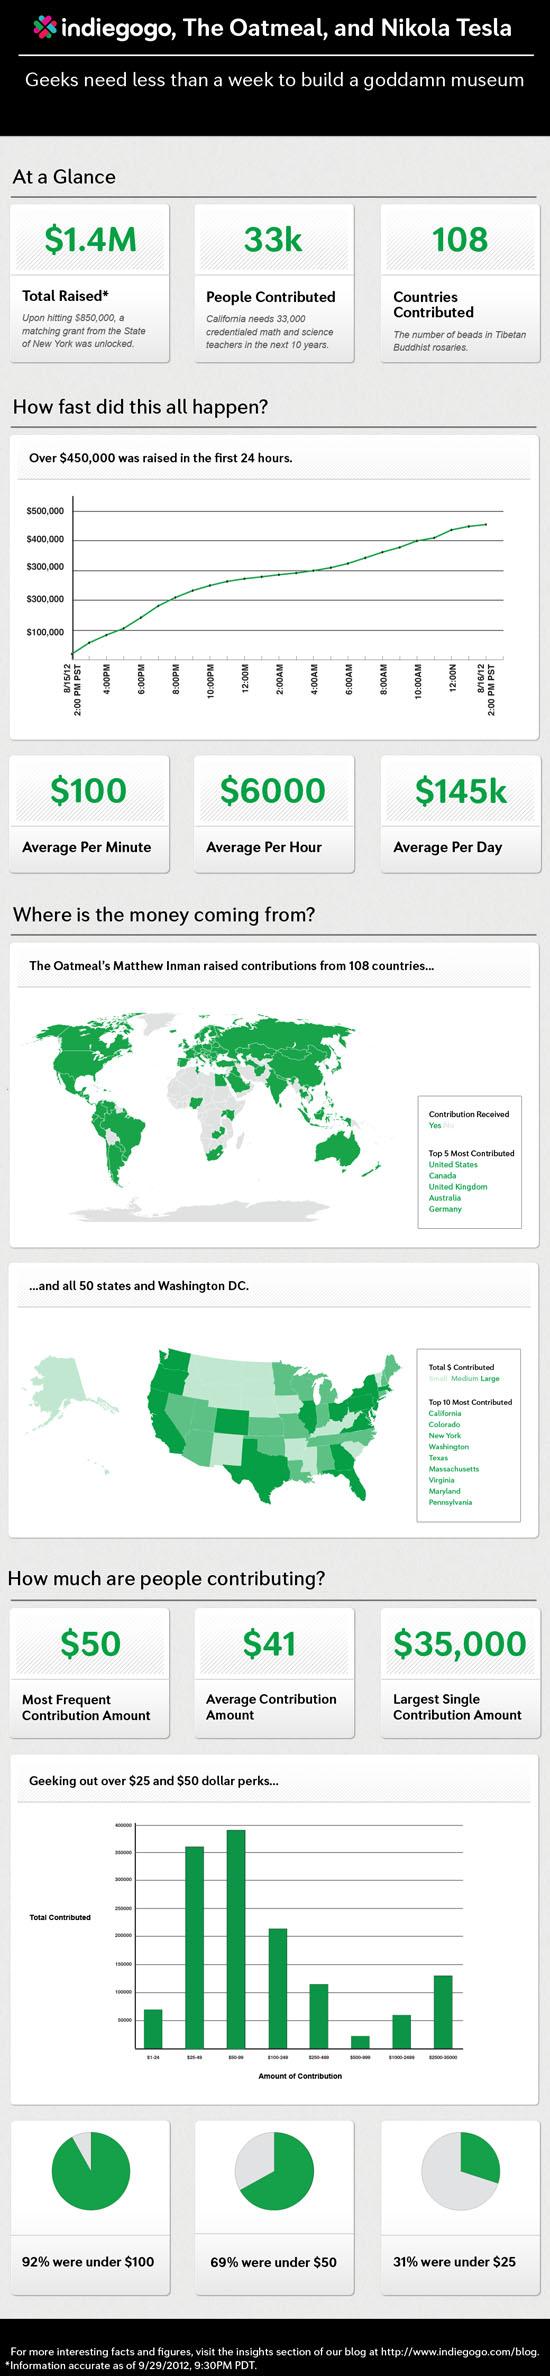 IndieGoGo Infographic